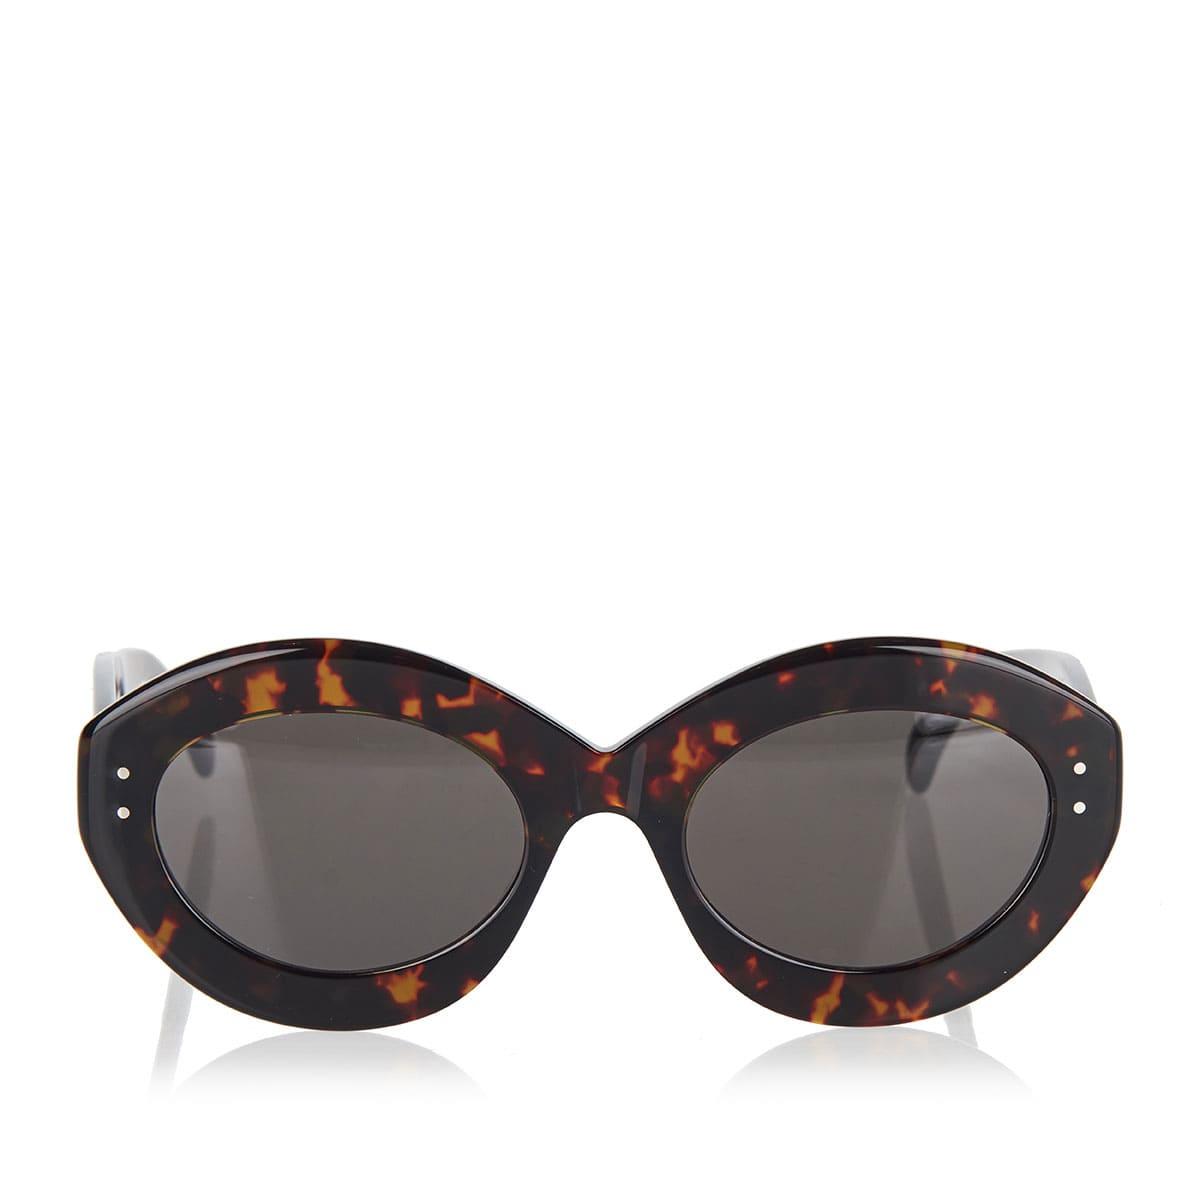 Oversized oval sunglasses